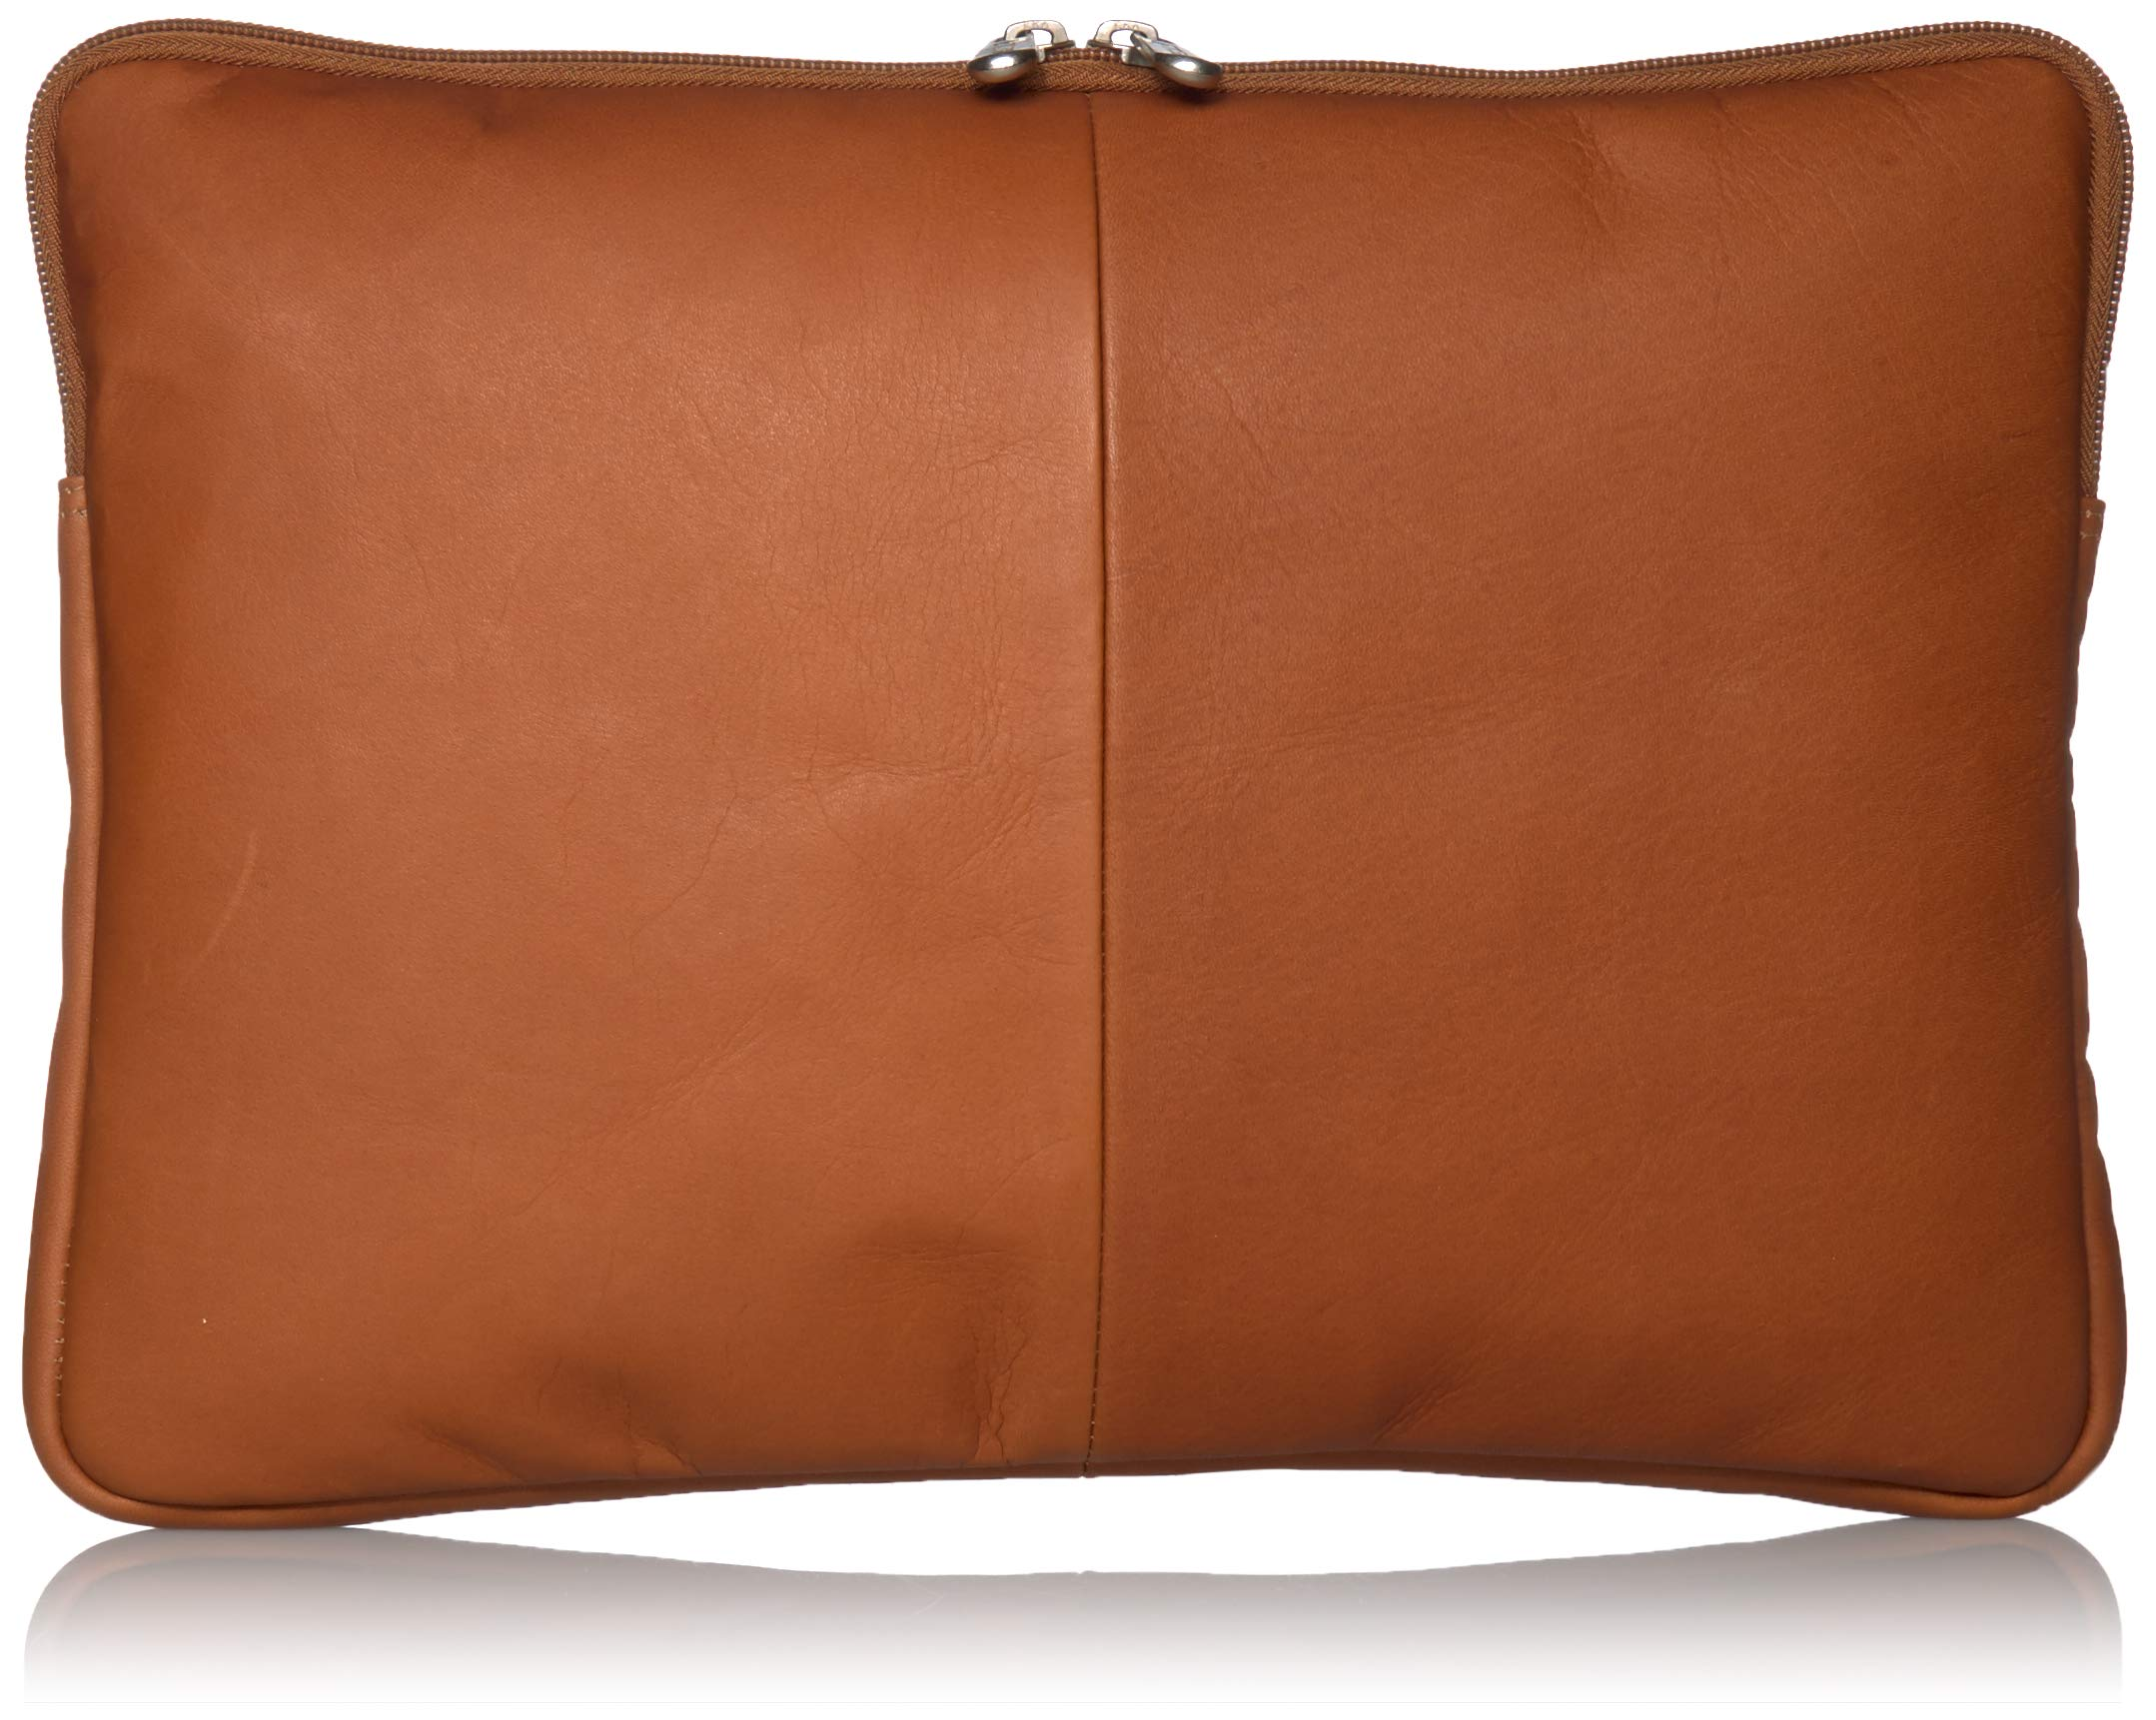 Piel Leather 13 Inch Zip Laptop Sleeve, Saddle, One Size